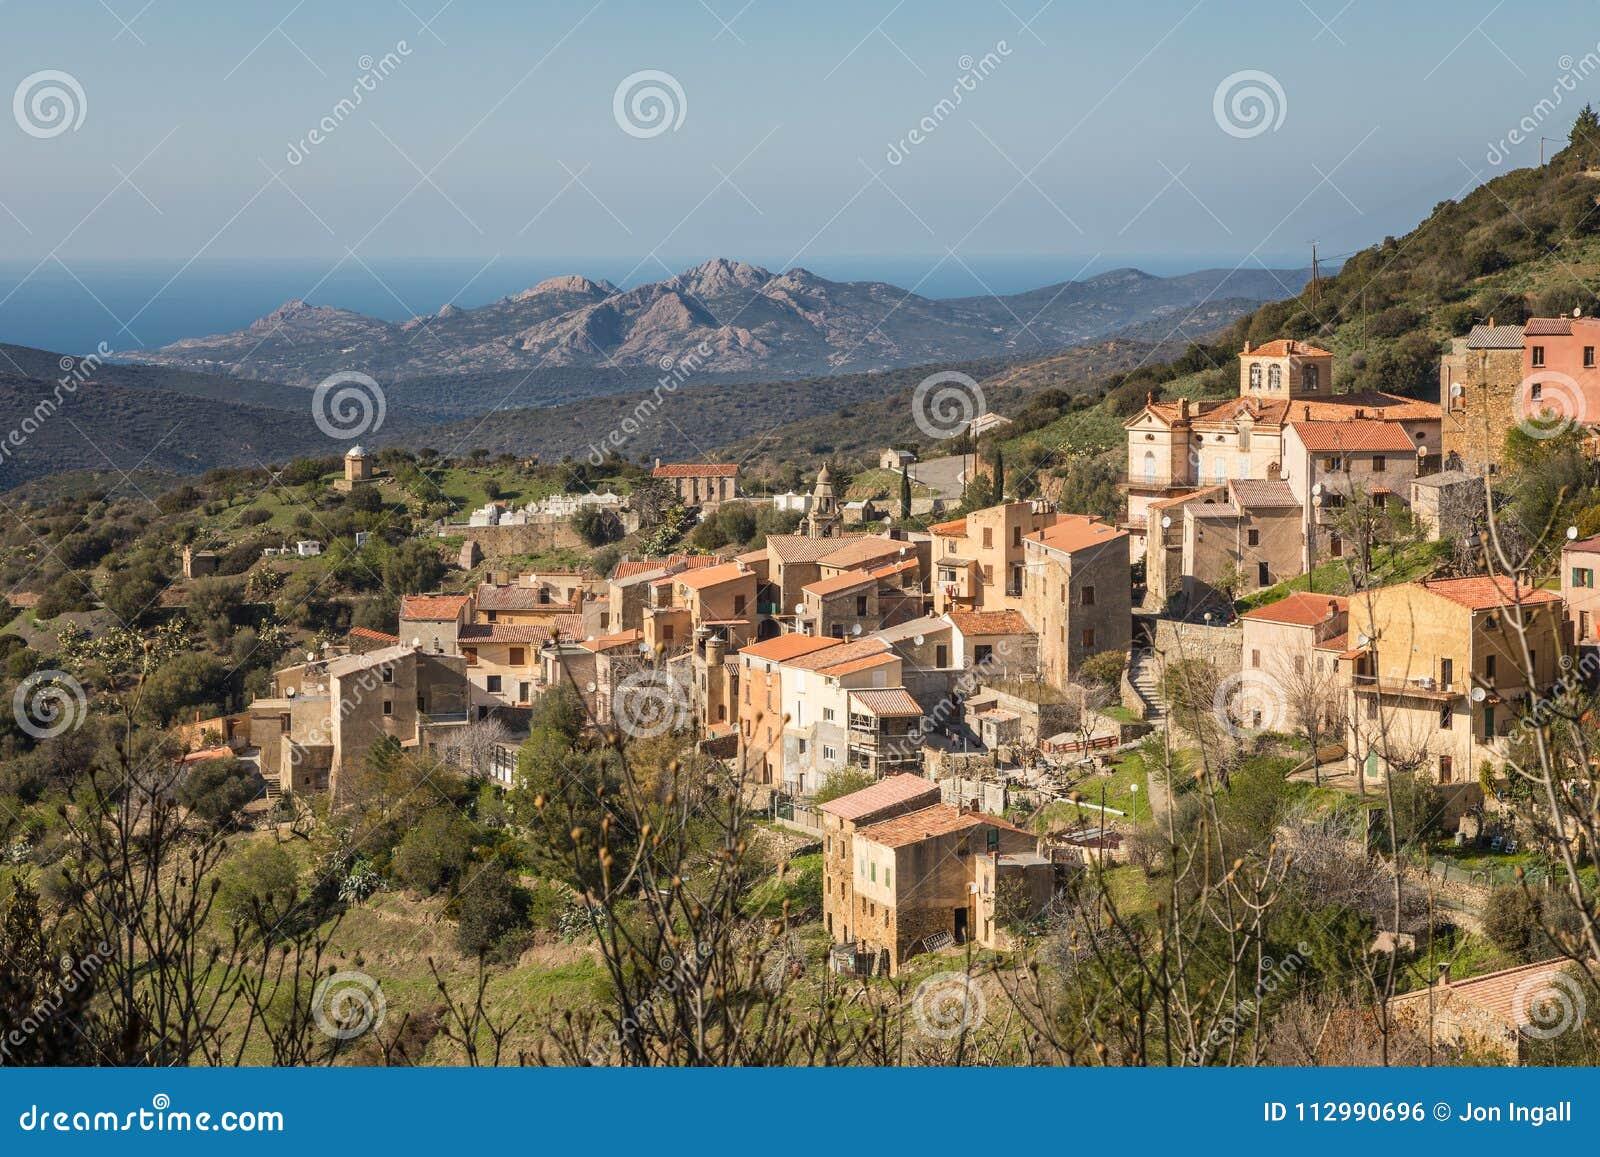 Village of Novella in Balagne region of Corsica